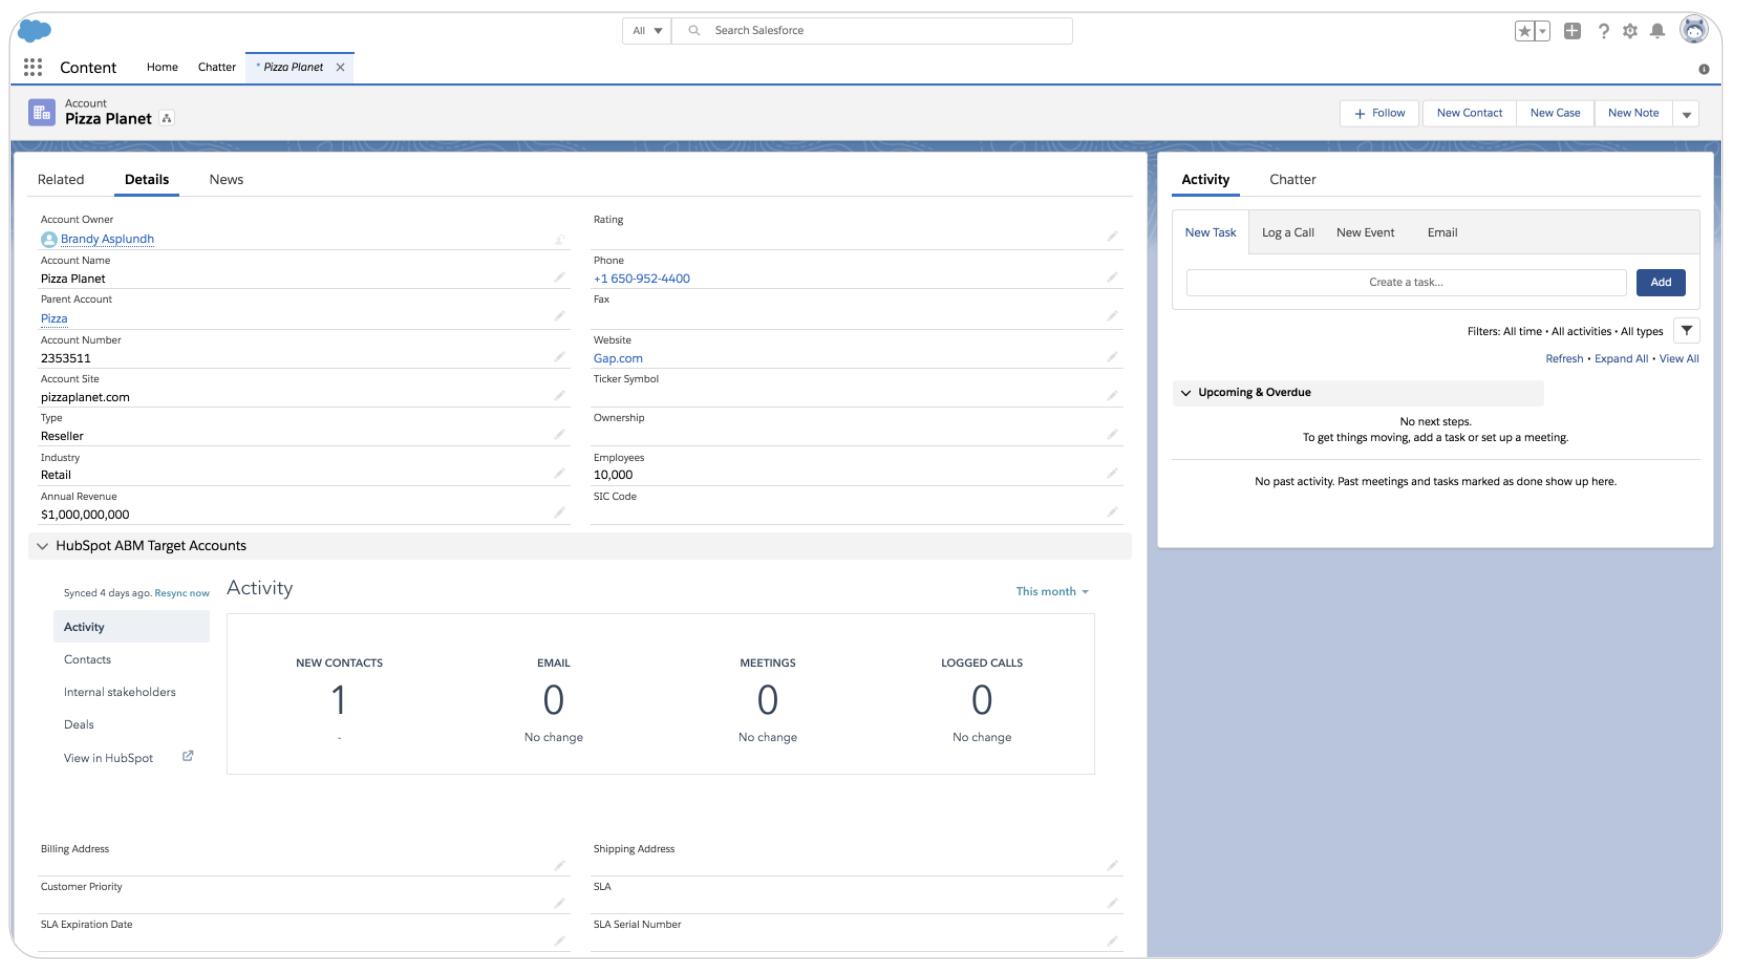 salesforce integration_hubspot product updates